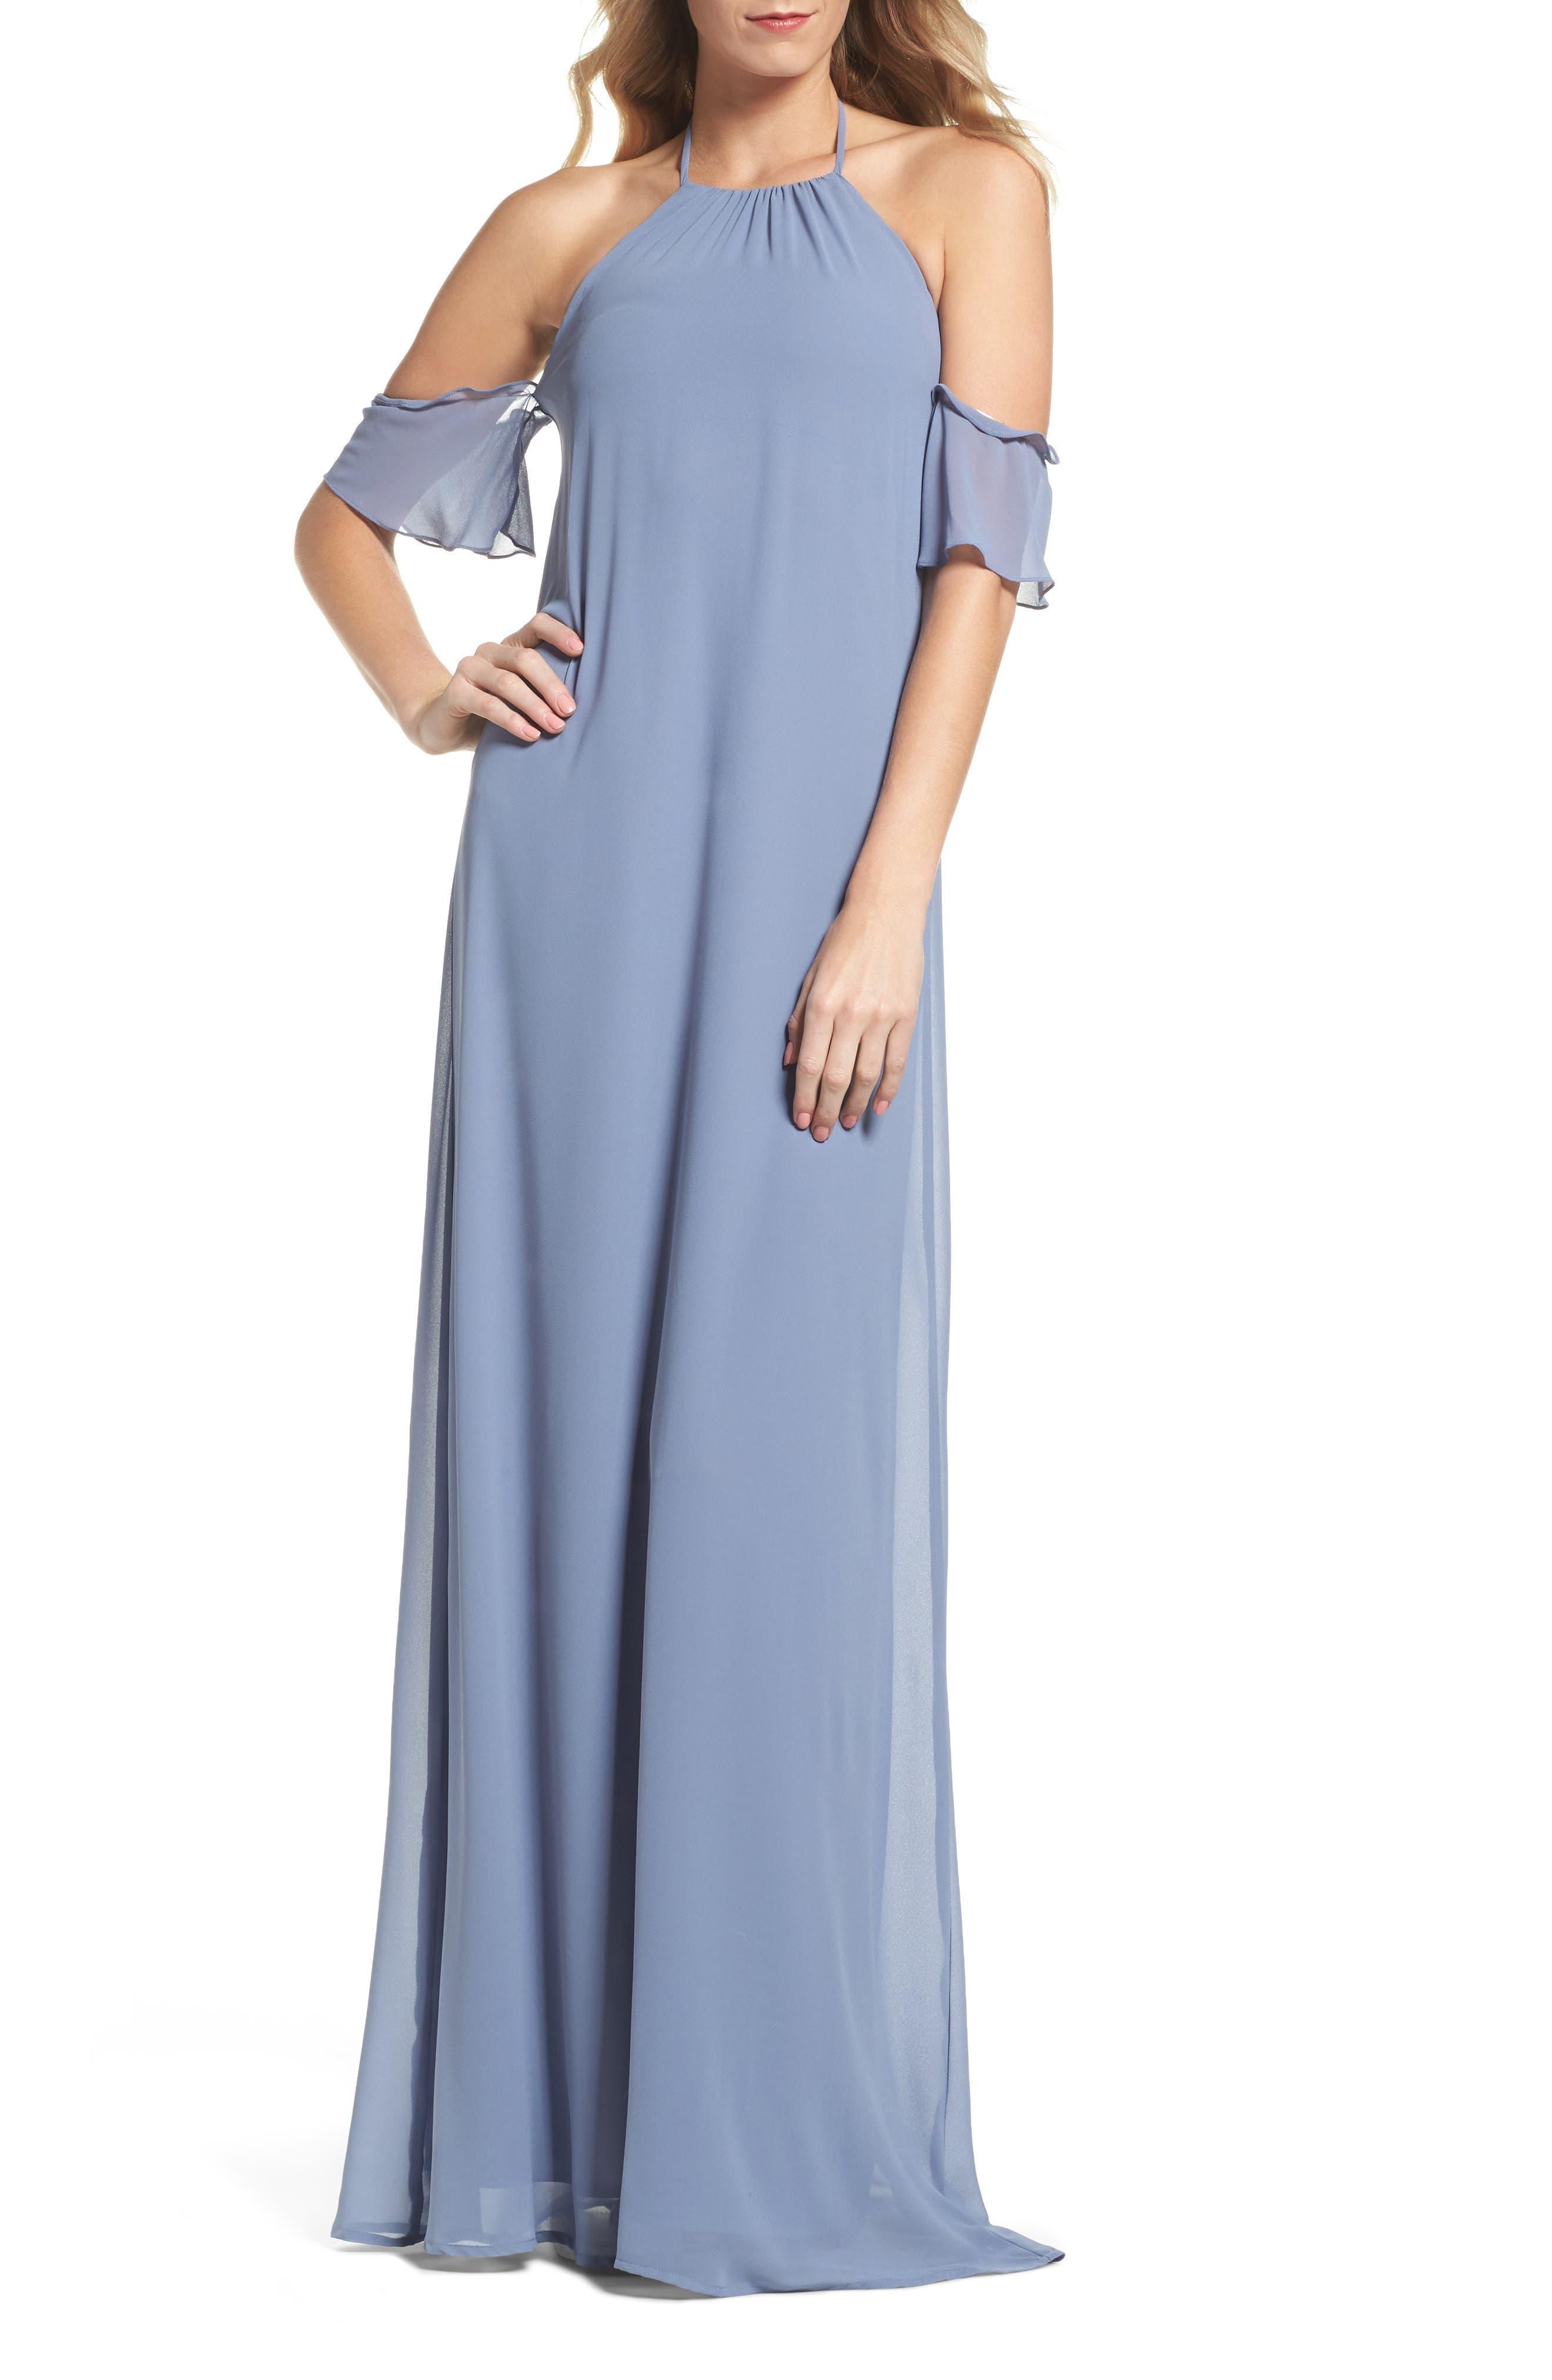 Bridesmaid Dresses Short Sleeves